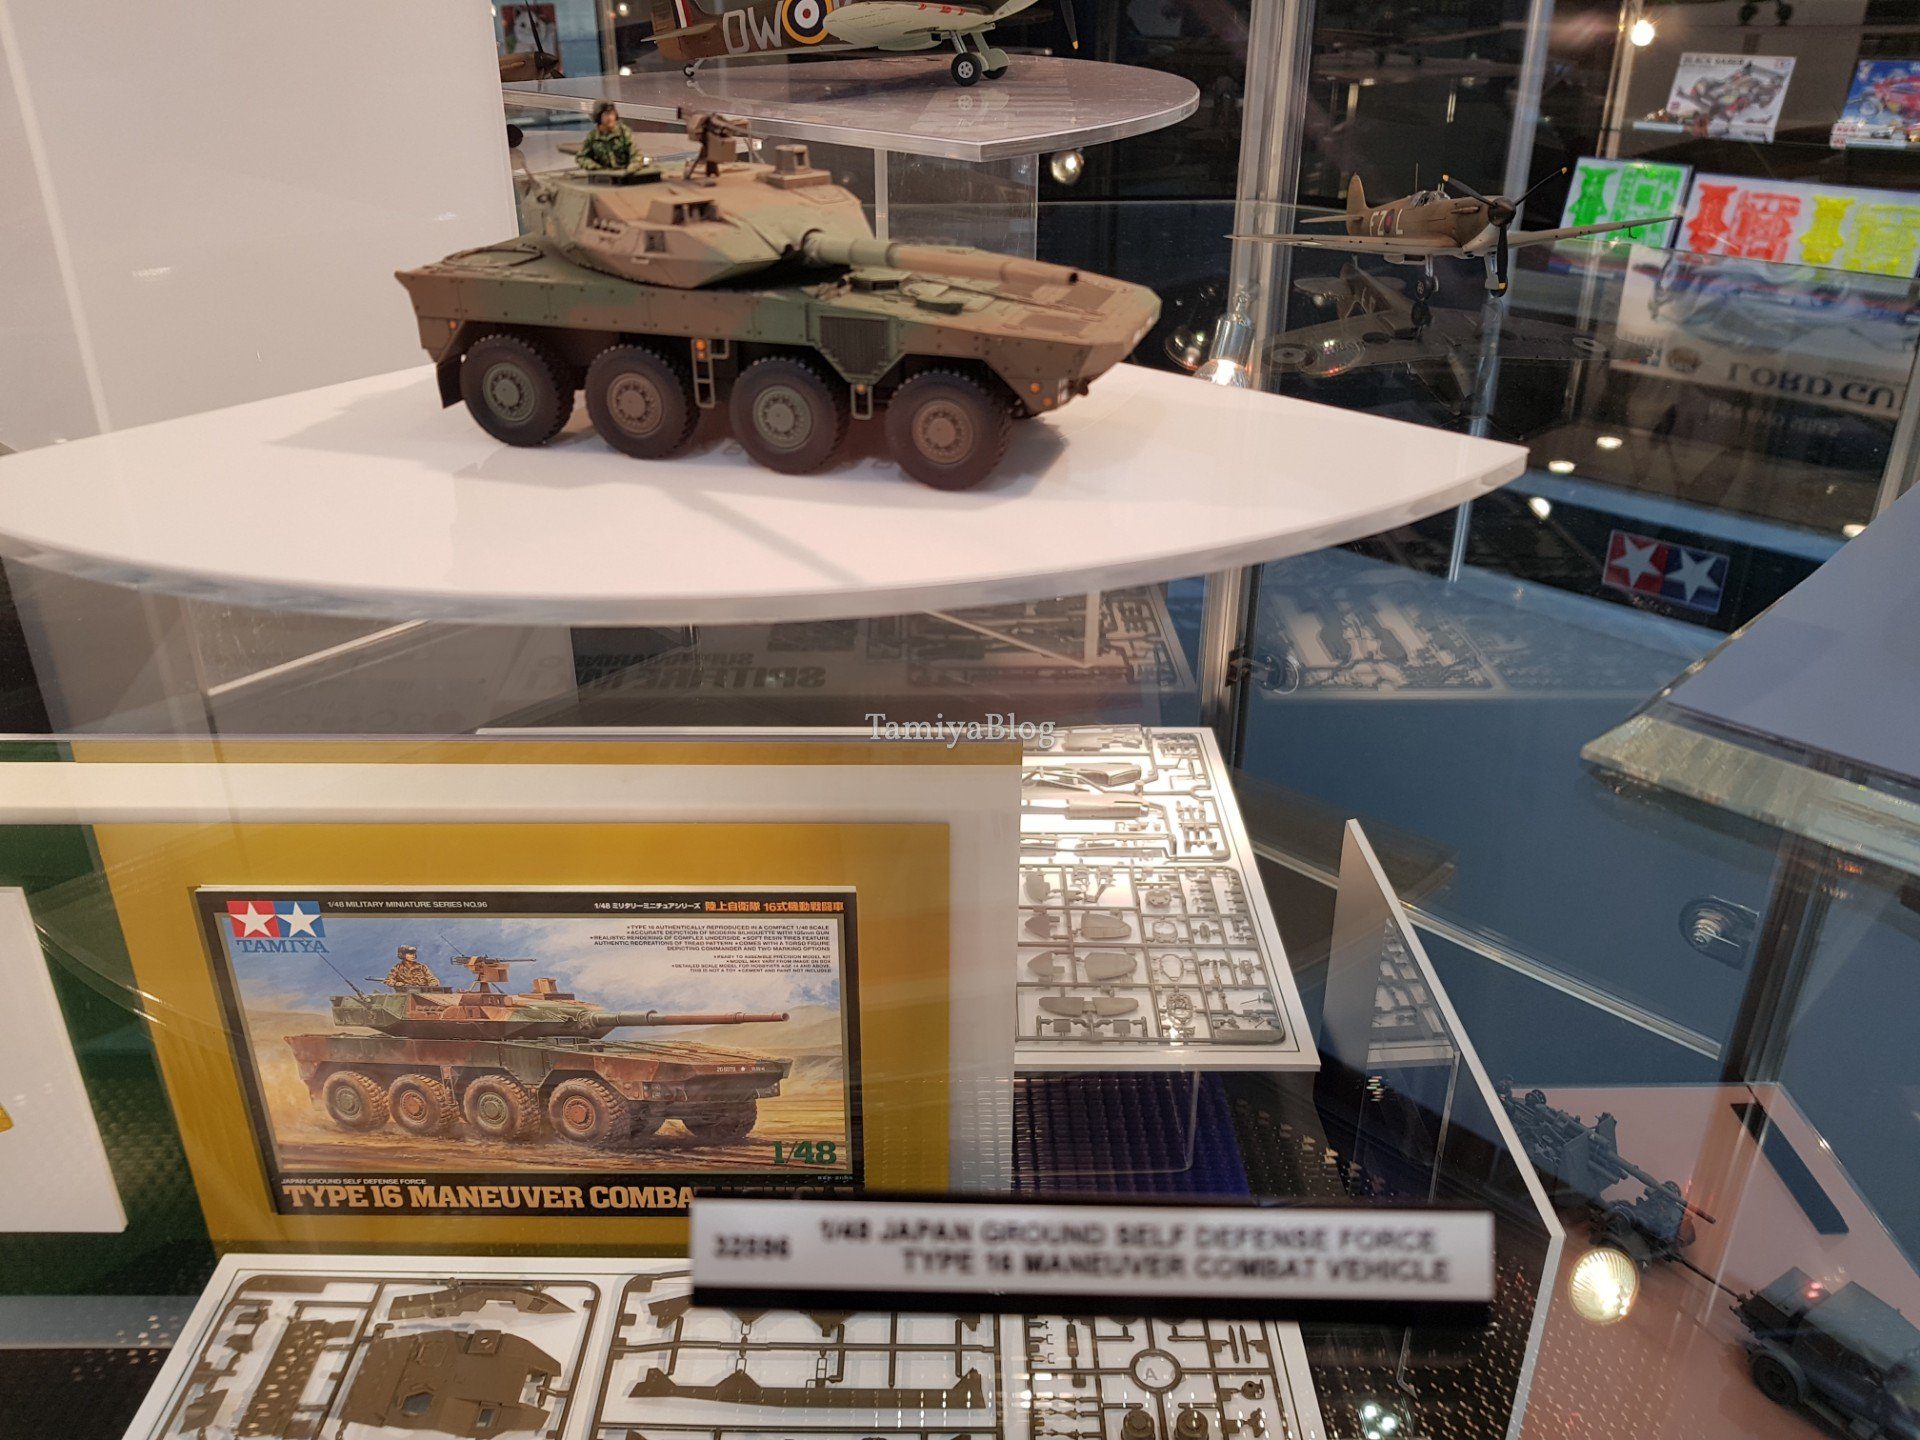 Tamiya new static military kits at Nuremberg Toy Fair 2019 - TamiyaBlog